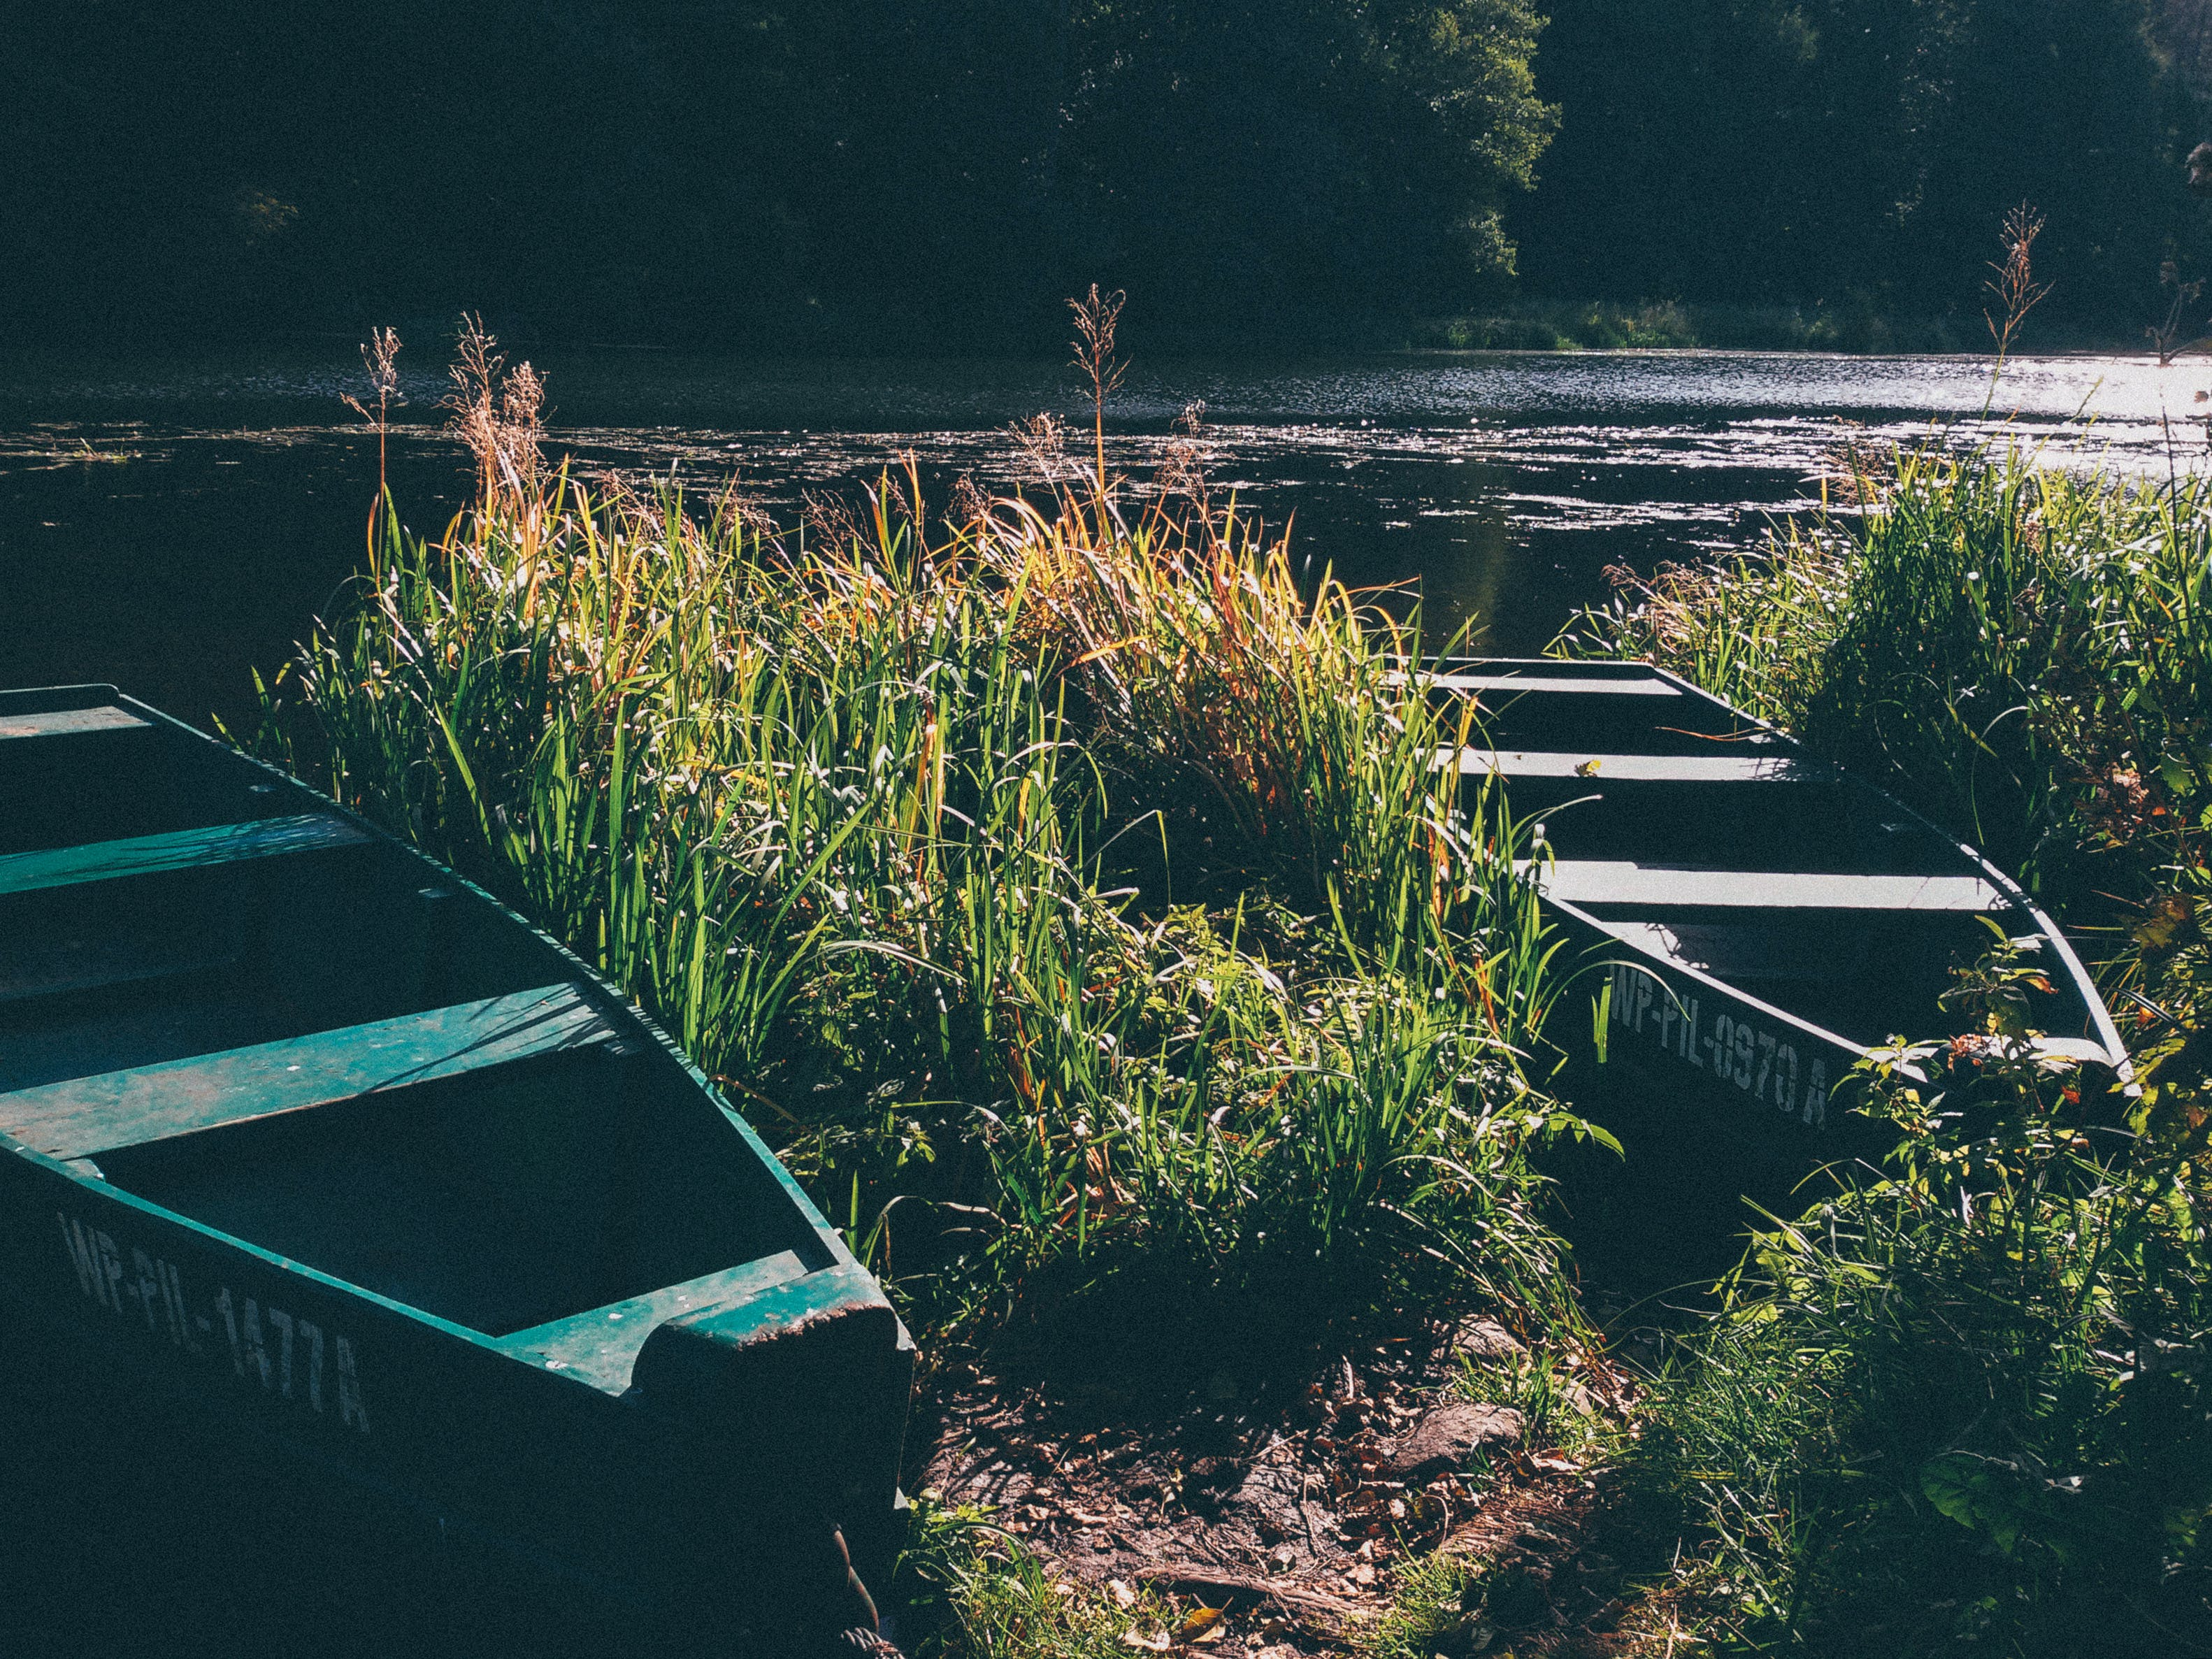 boat, nature, river